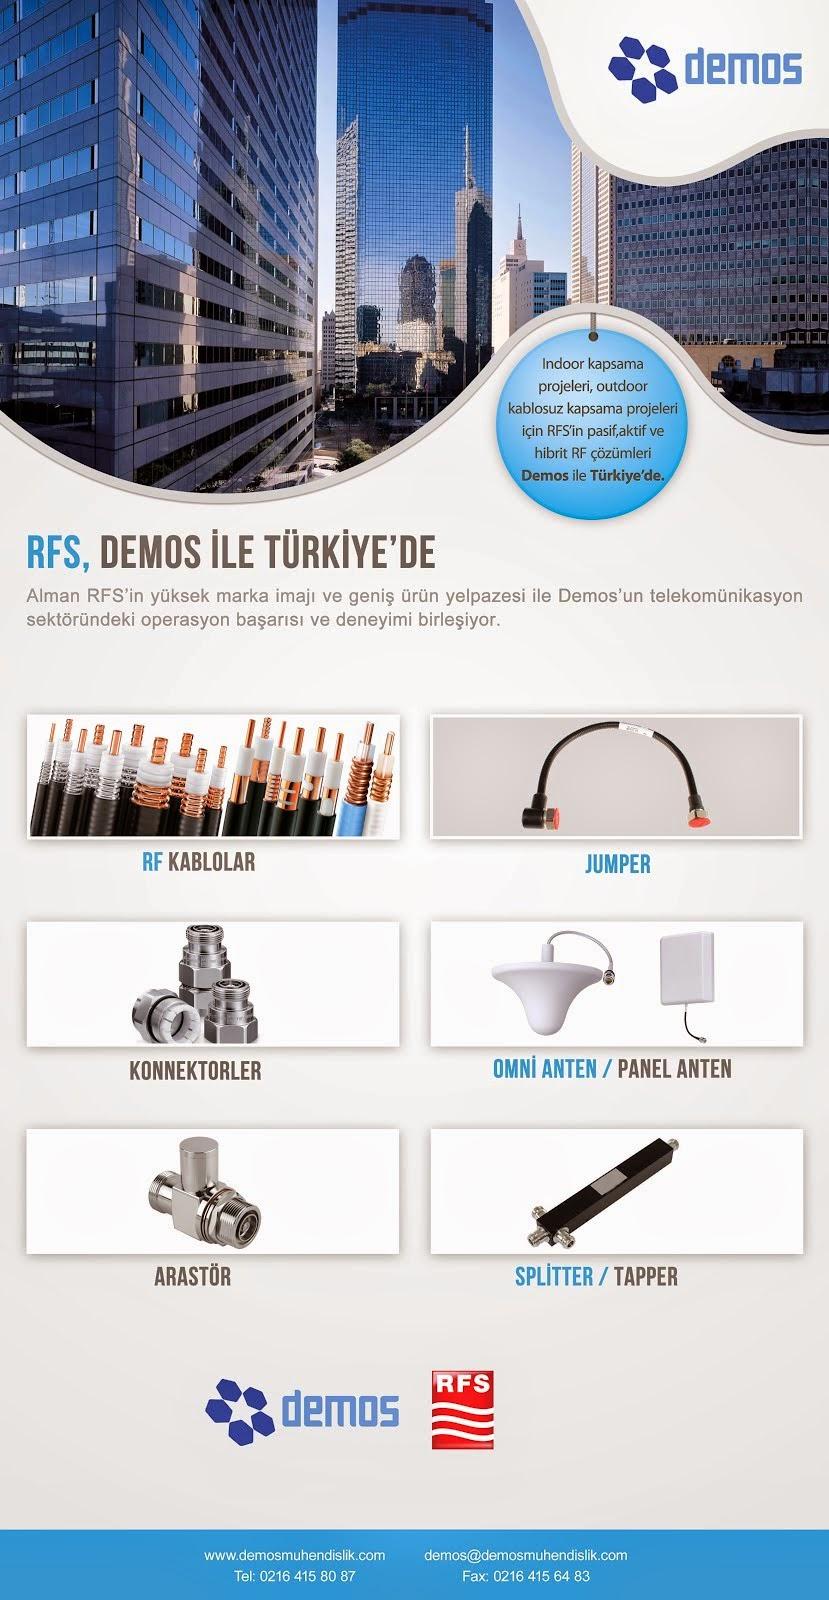 Demos - RFS